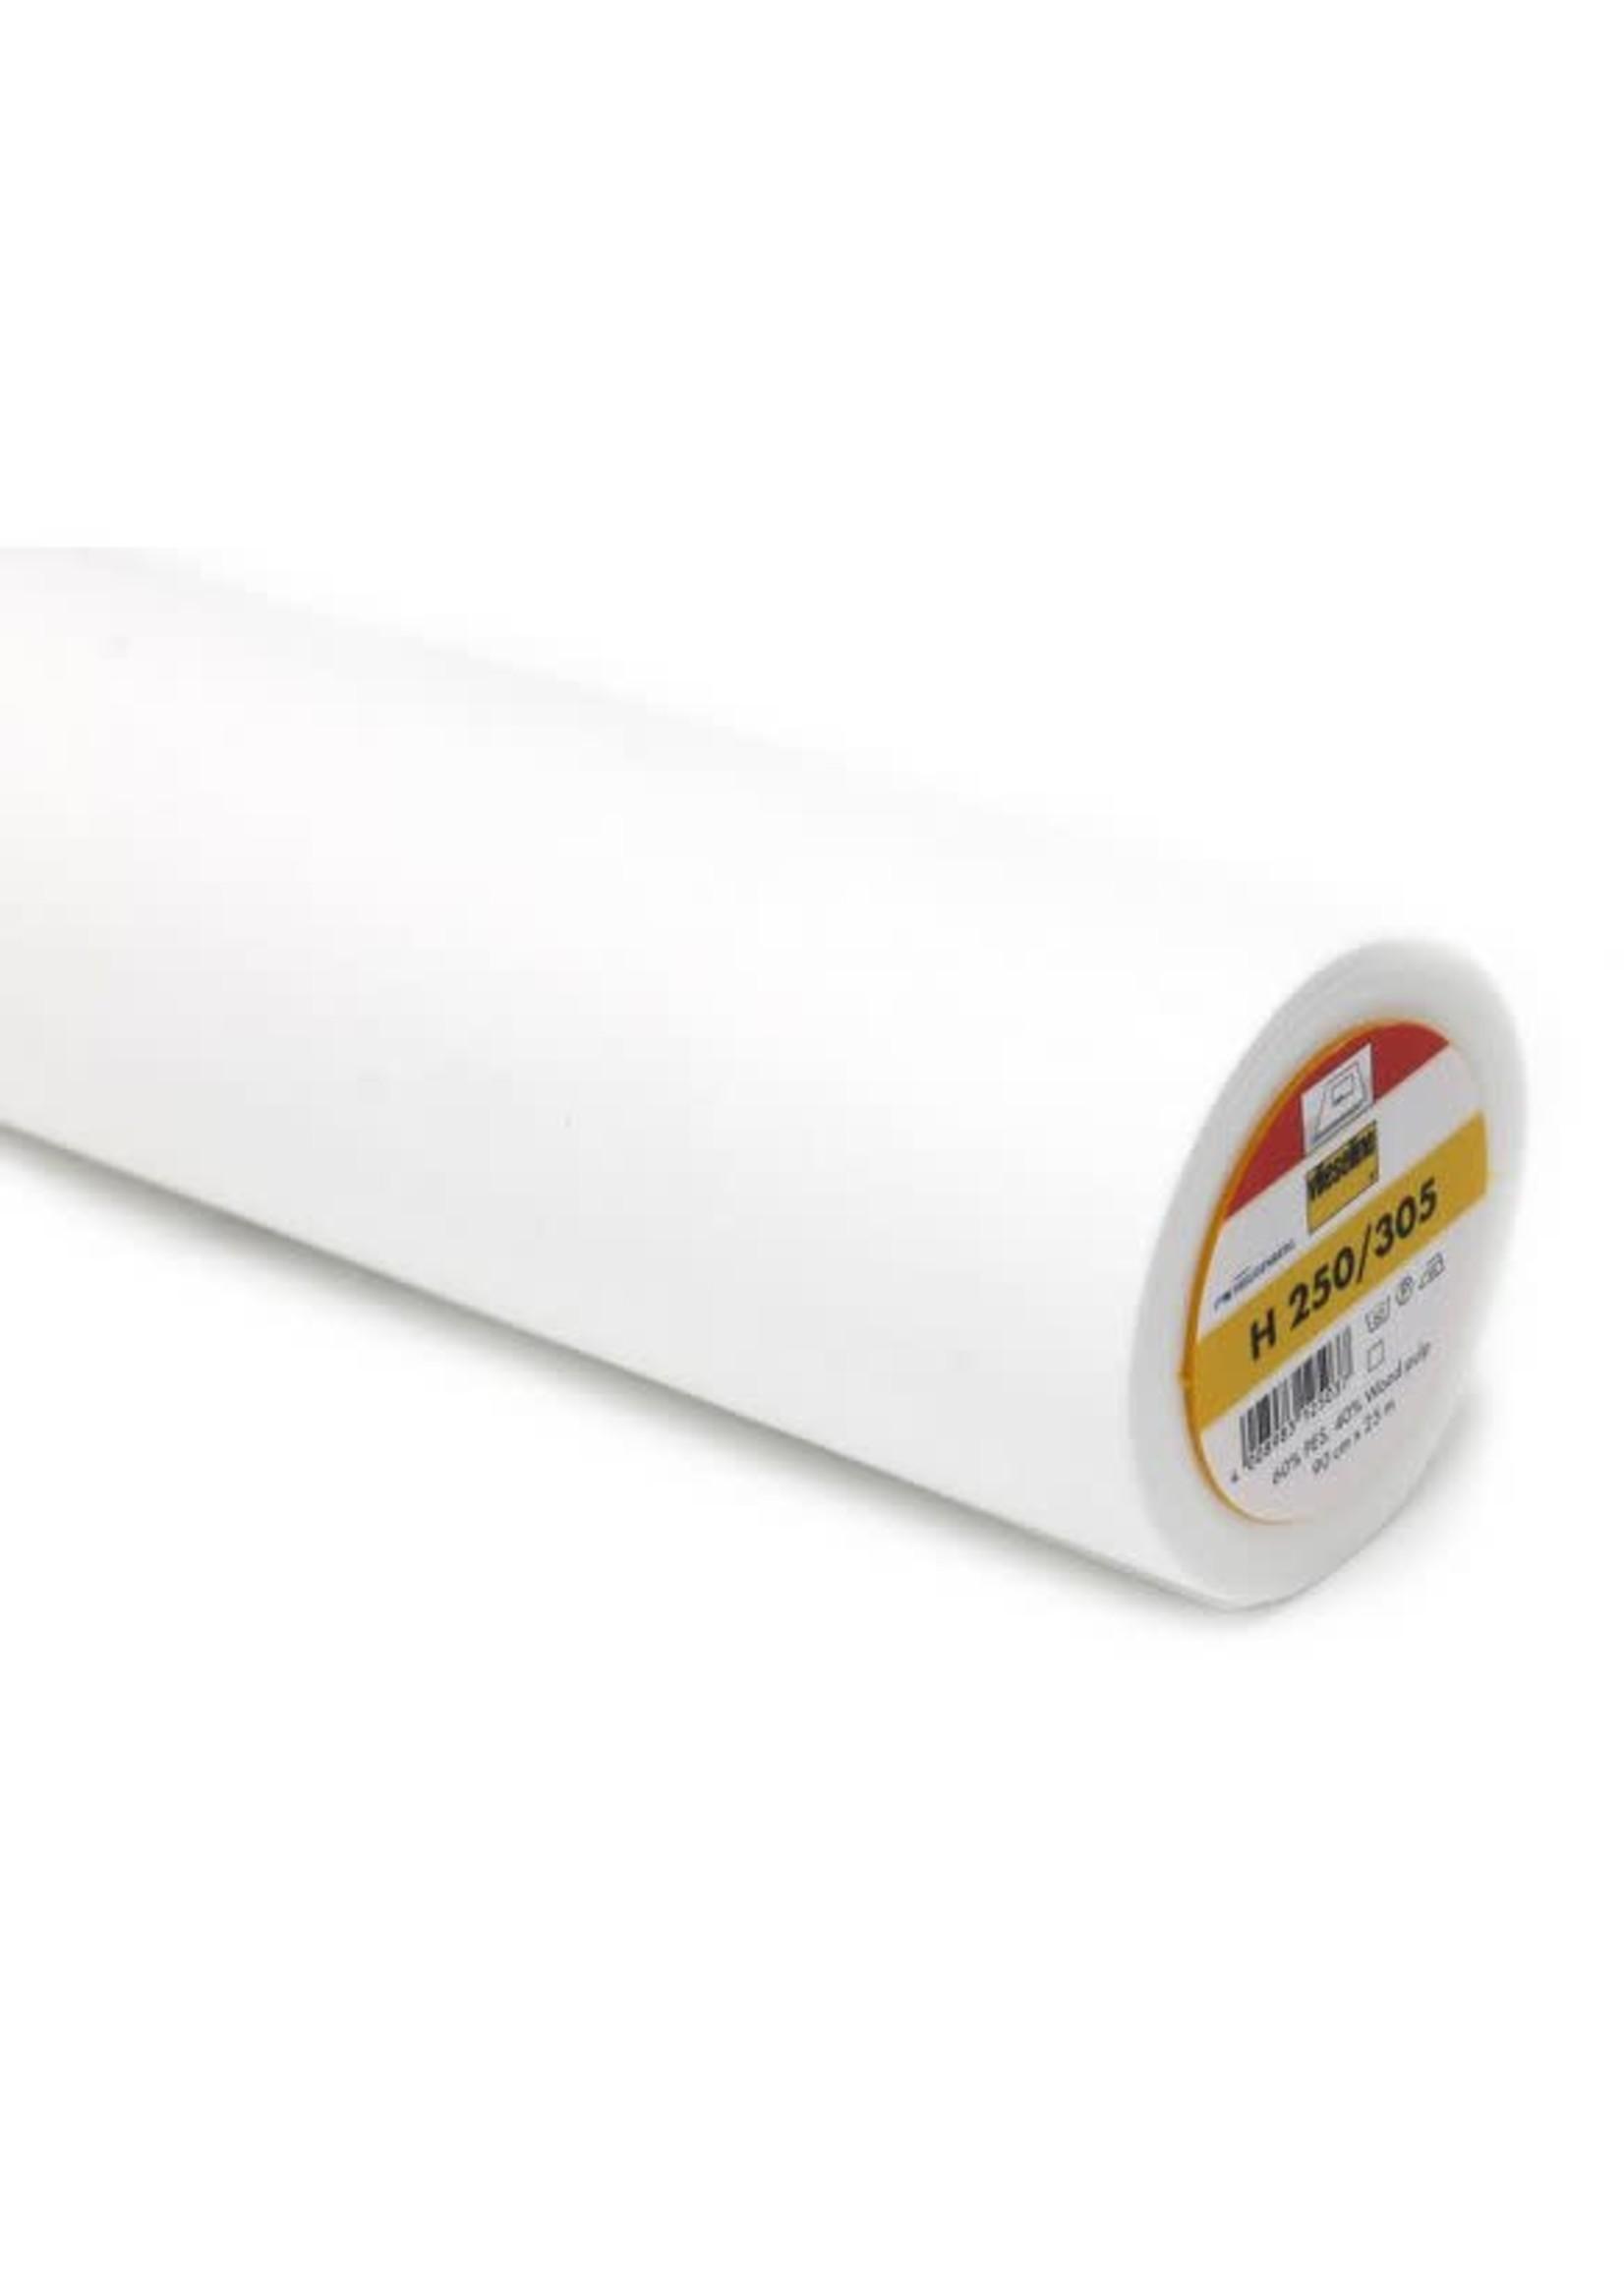 Vlieseline Vlieseline H250 90 cm